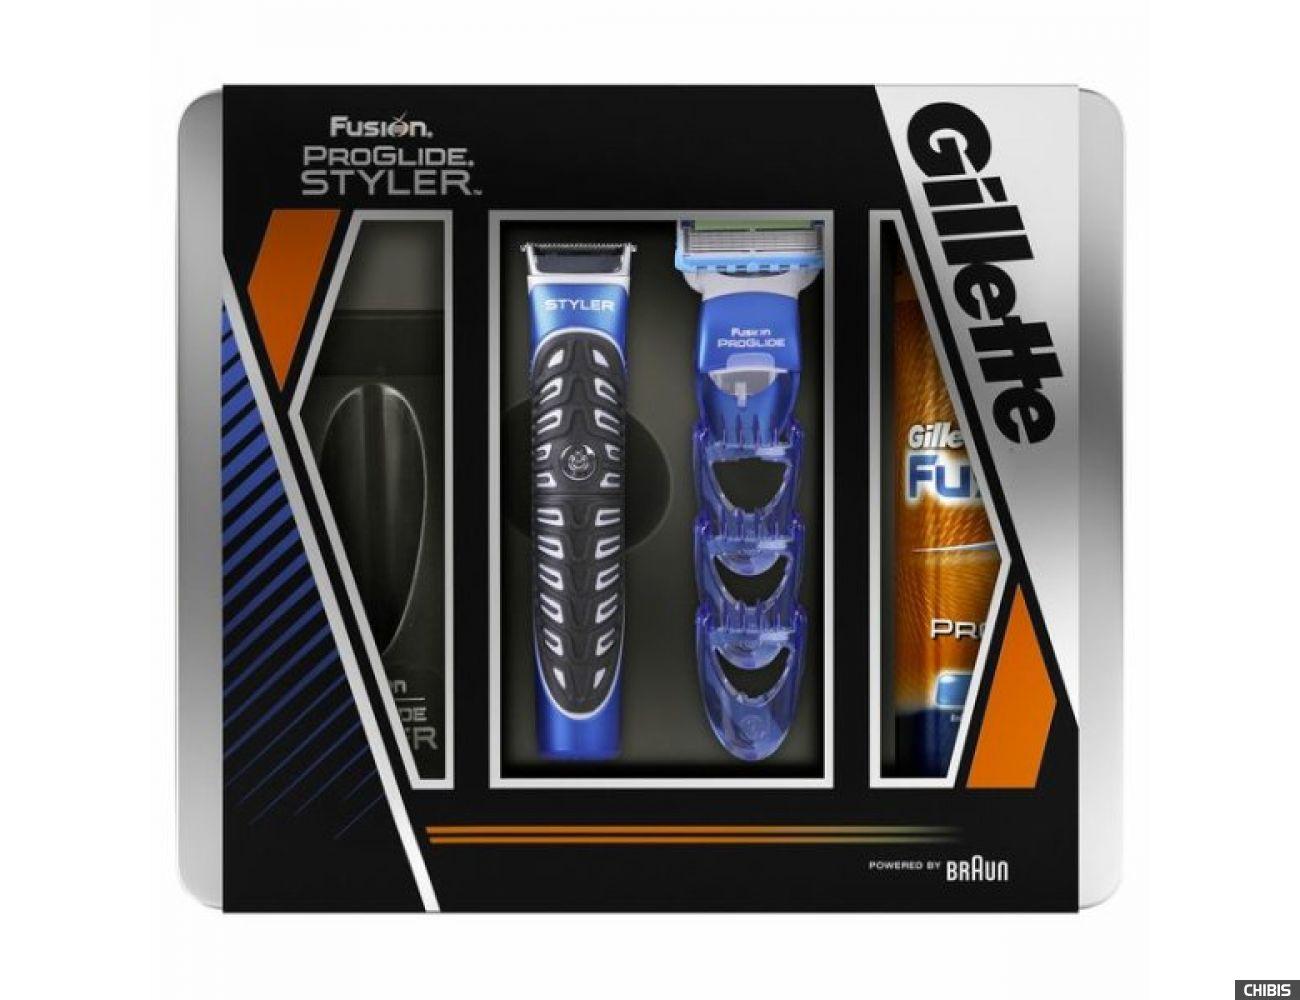 Gillette Styler Fusion ProGlide Power триммер для бороды и усов + гел д/б 200мл мет уп 7702018359677